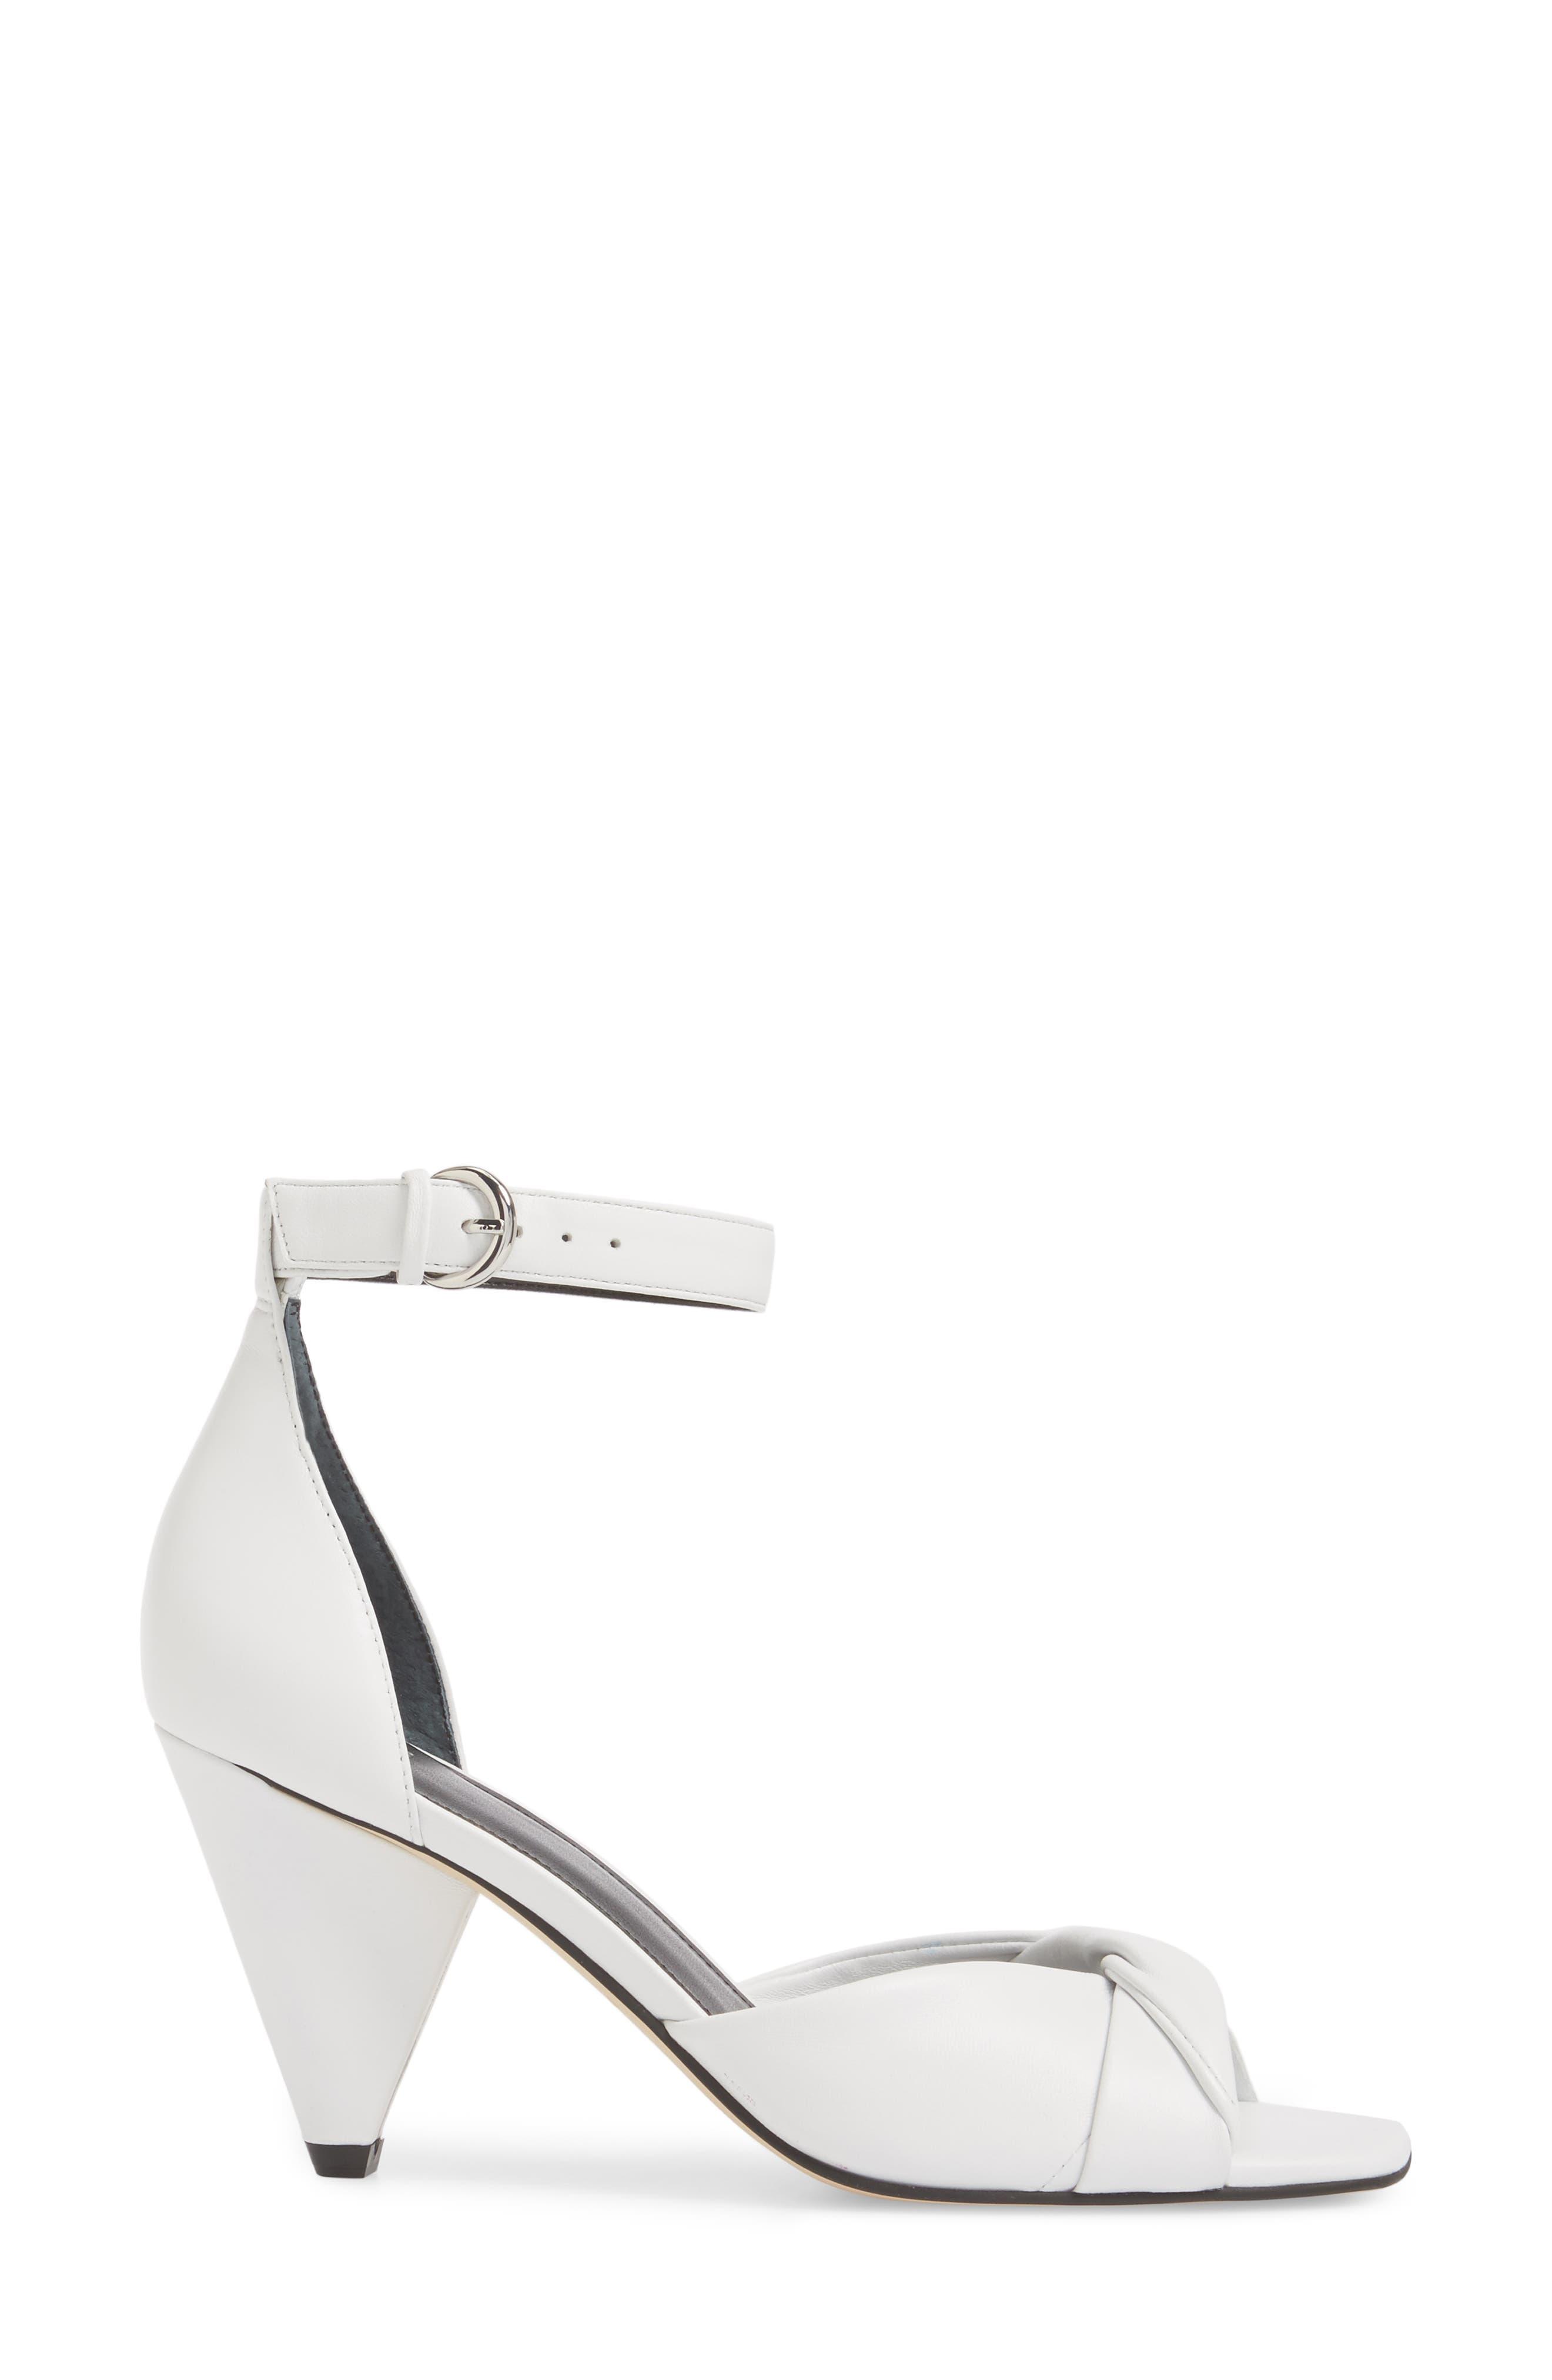 Ivory Sandal,                             Alternate thumbnail 3, color,                             White Leather